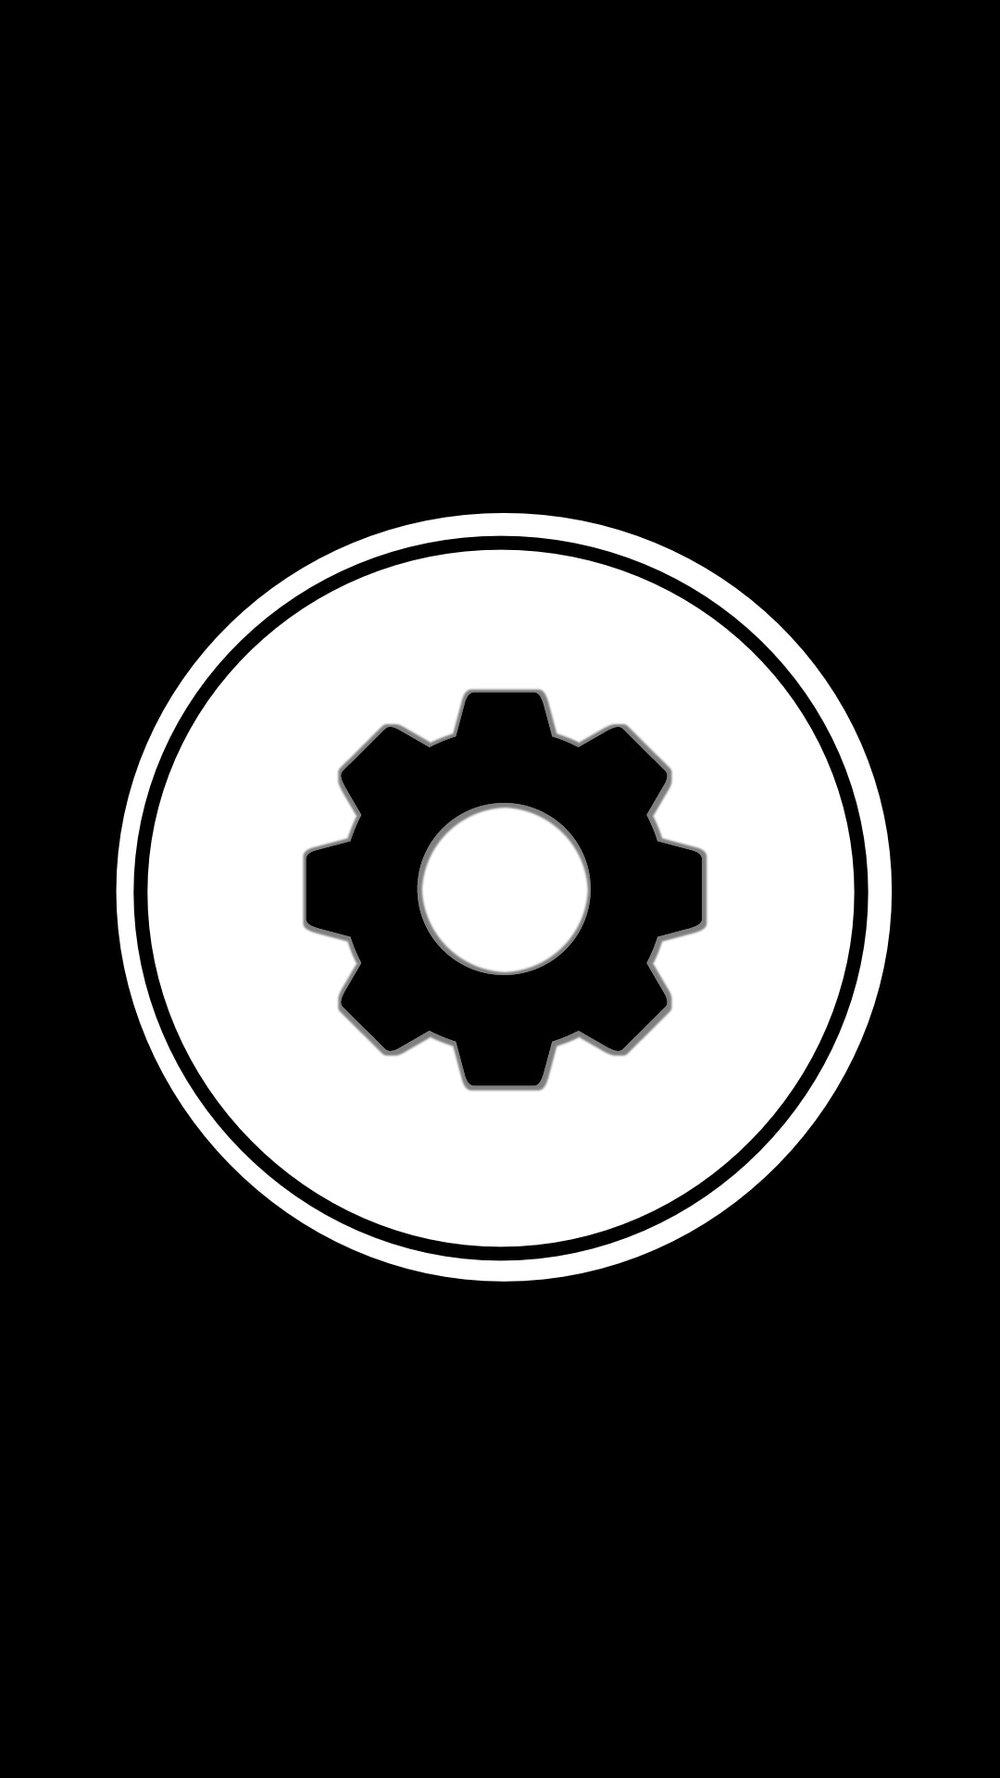 Instagram-cover-tool-black.jpg